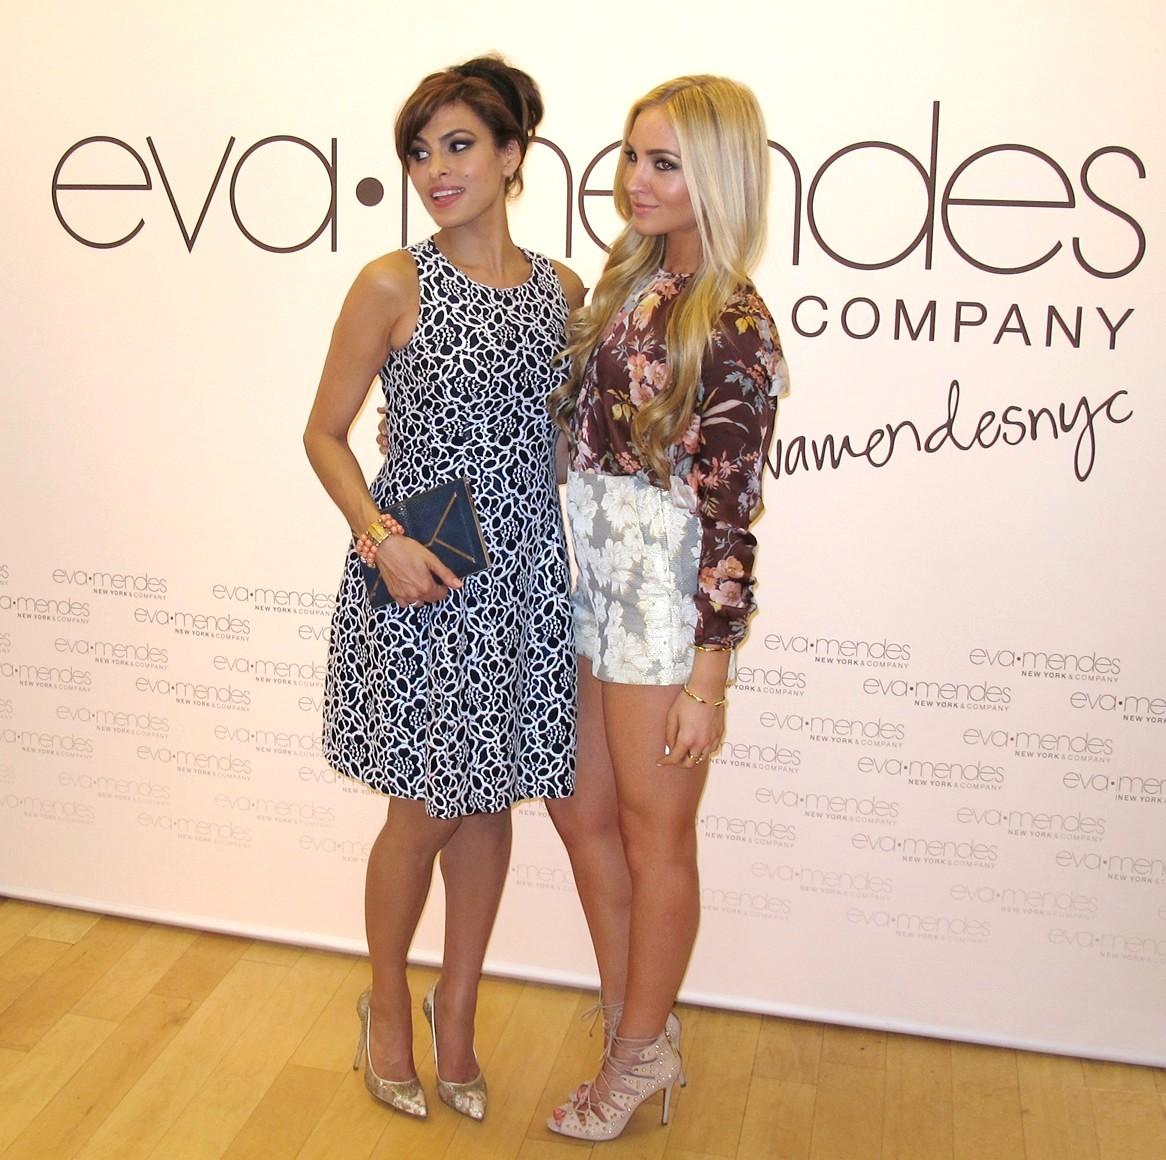 Eva Mendes_EVA MENDES FOR NEW YORK & COMPANY POP UP SHOP